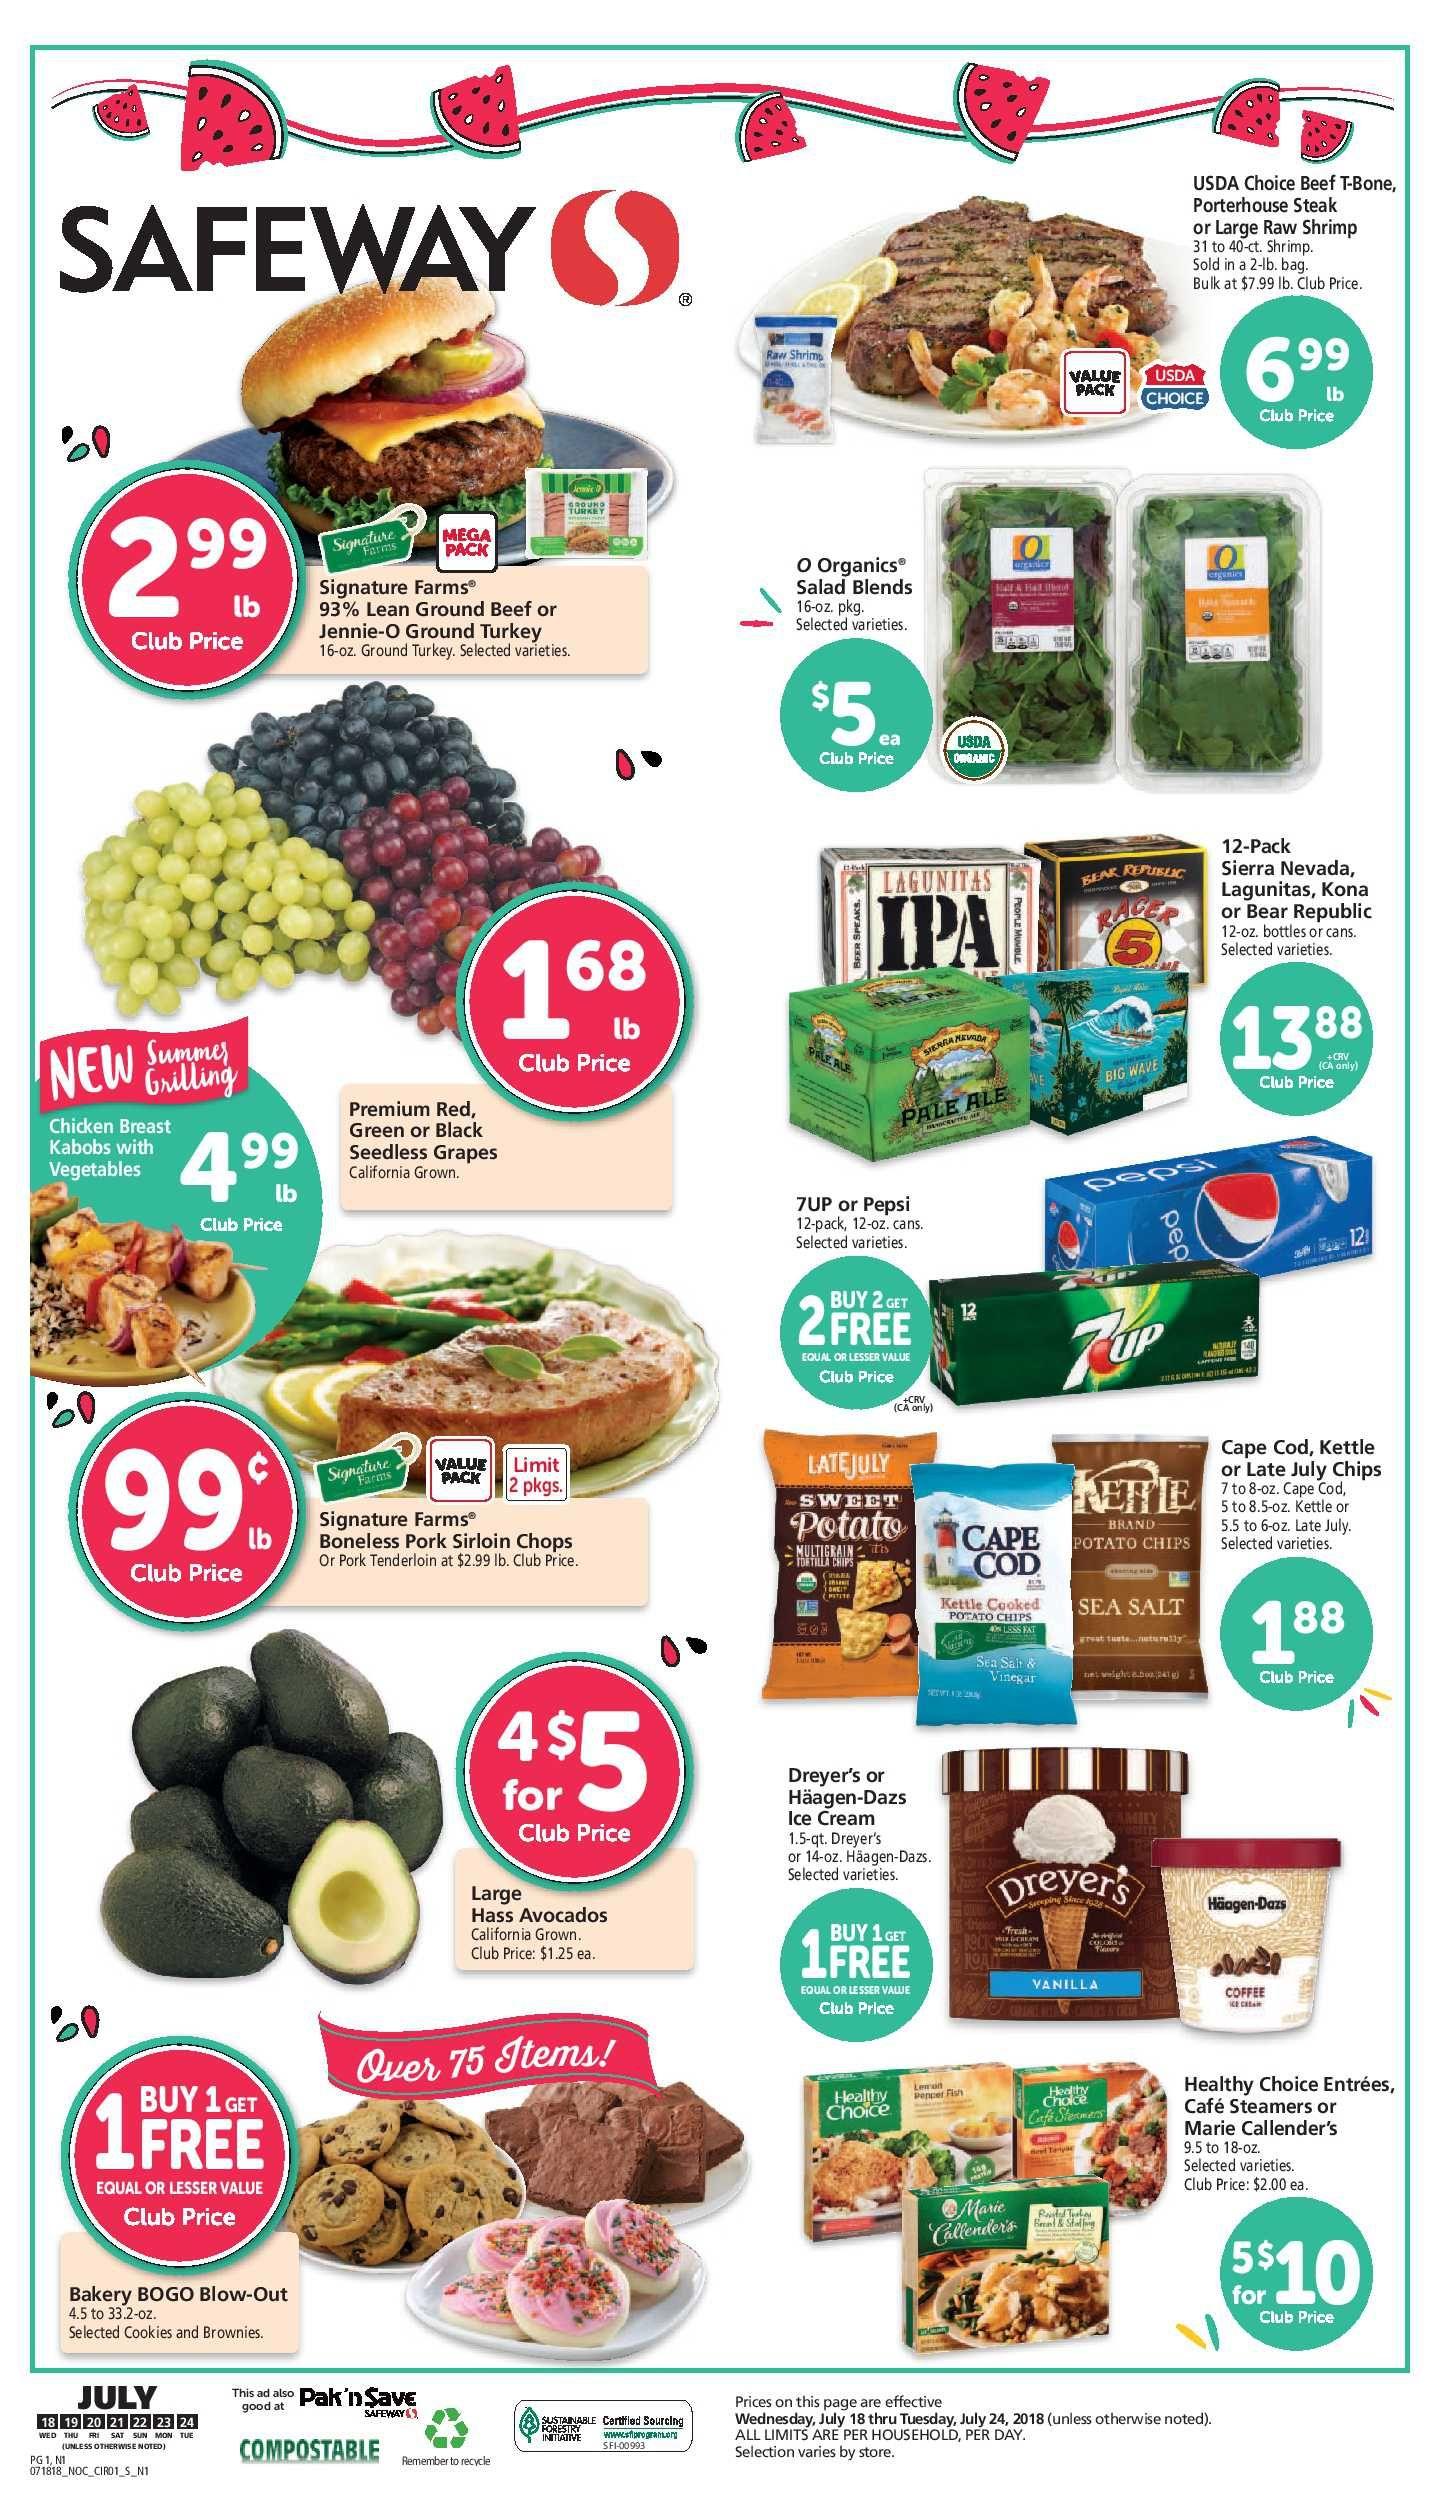 Safeway Weekly Ad Flyer 5 26 21 6 1 21 Weeklyad123 Com Weekly Ad Circular Grocery Stores Safeway Grocery Flyer Grocery Savings